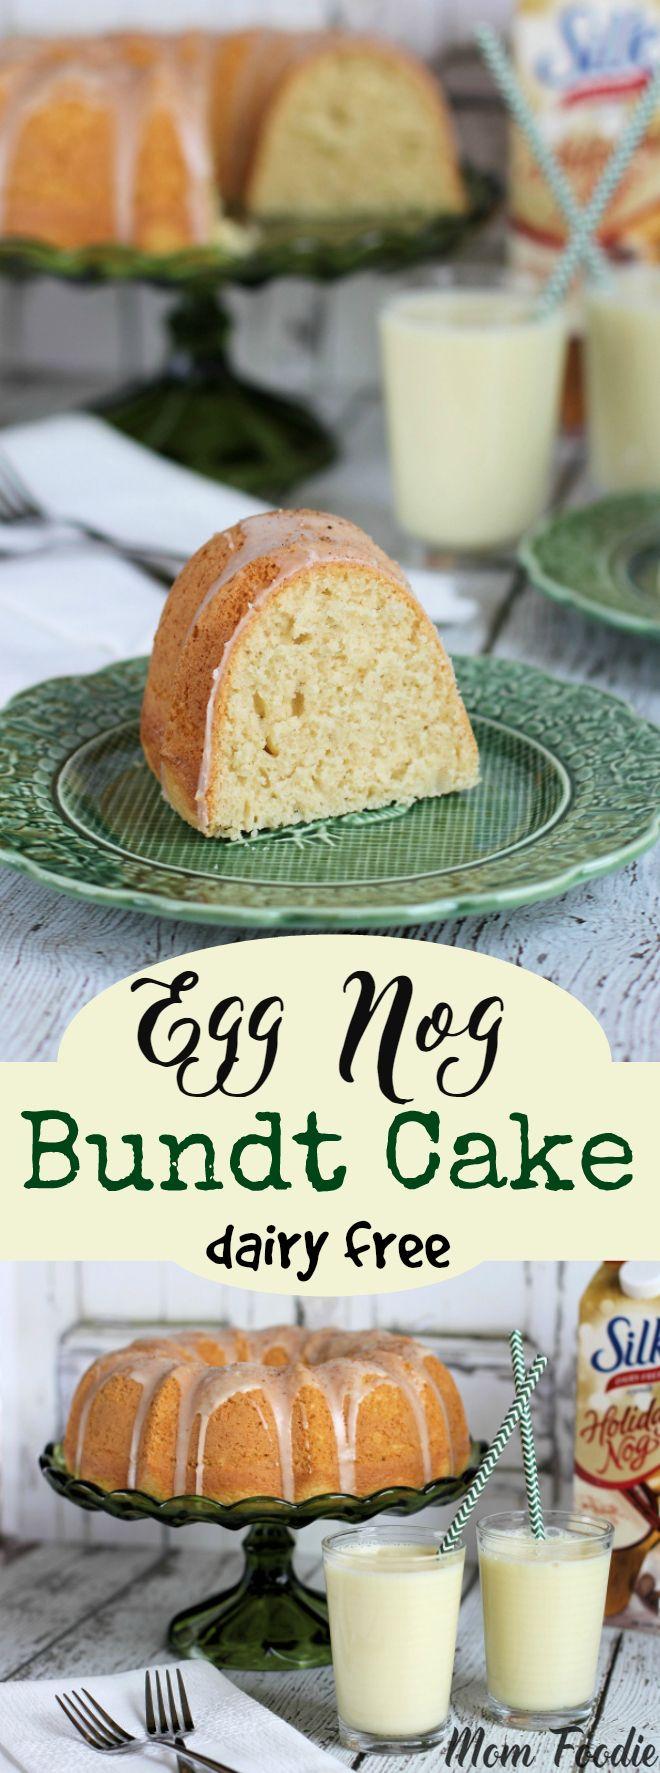 Eggnog Bundt Cake - dairy free